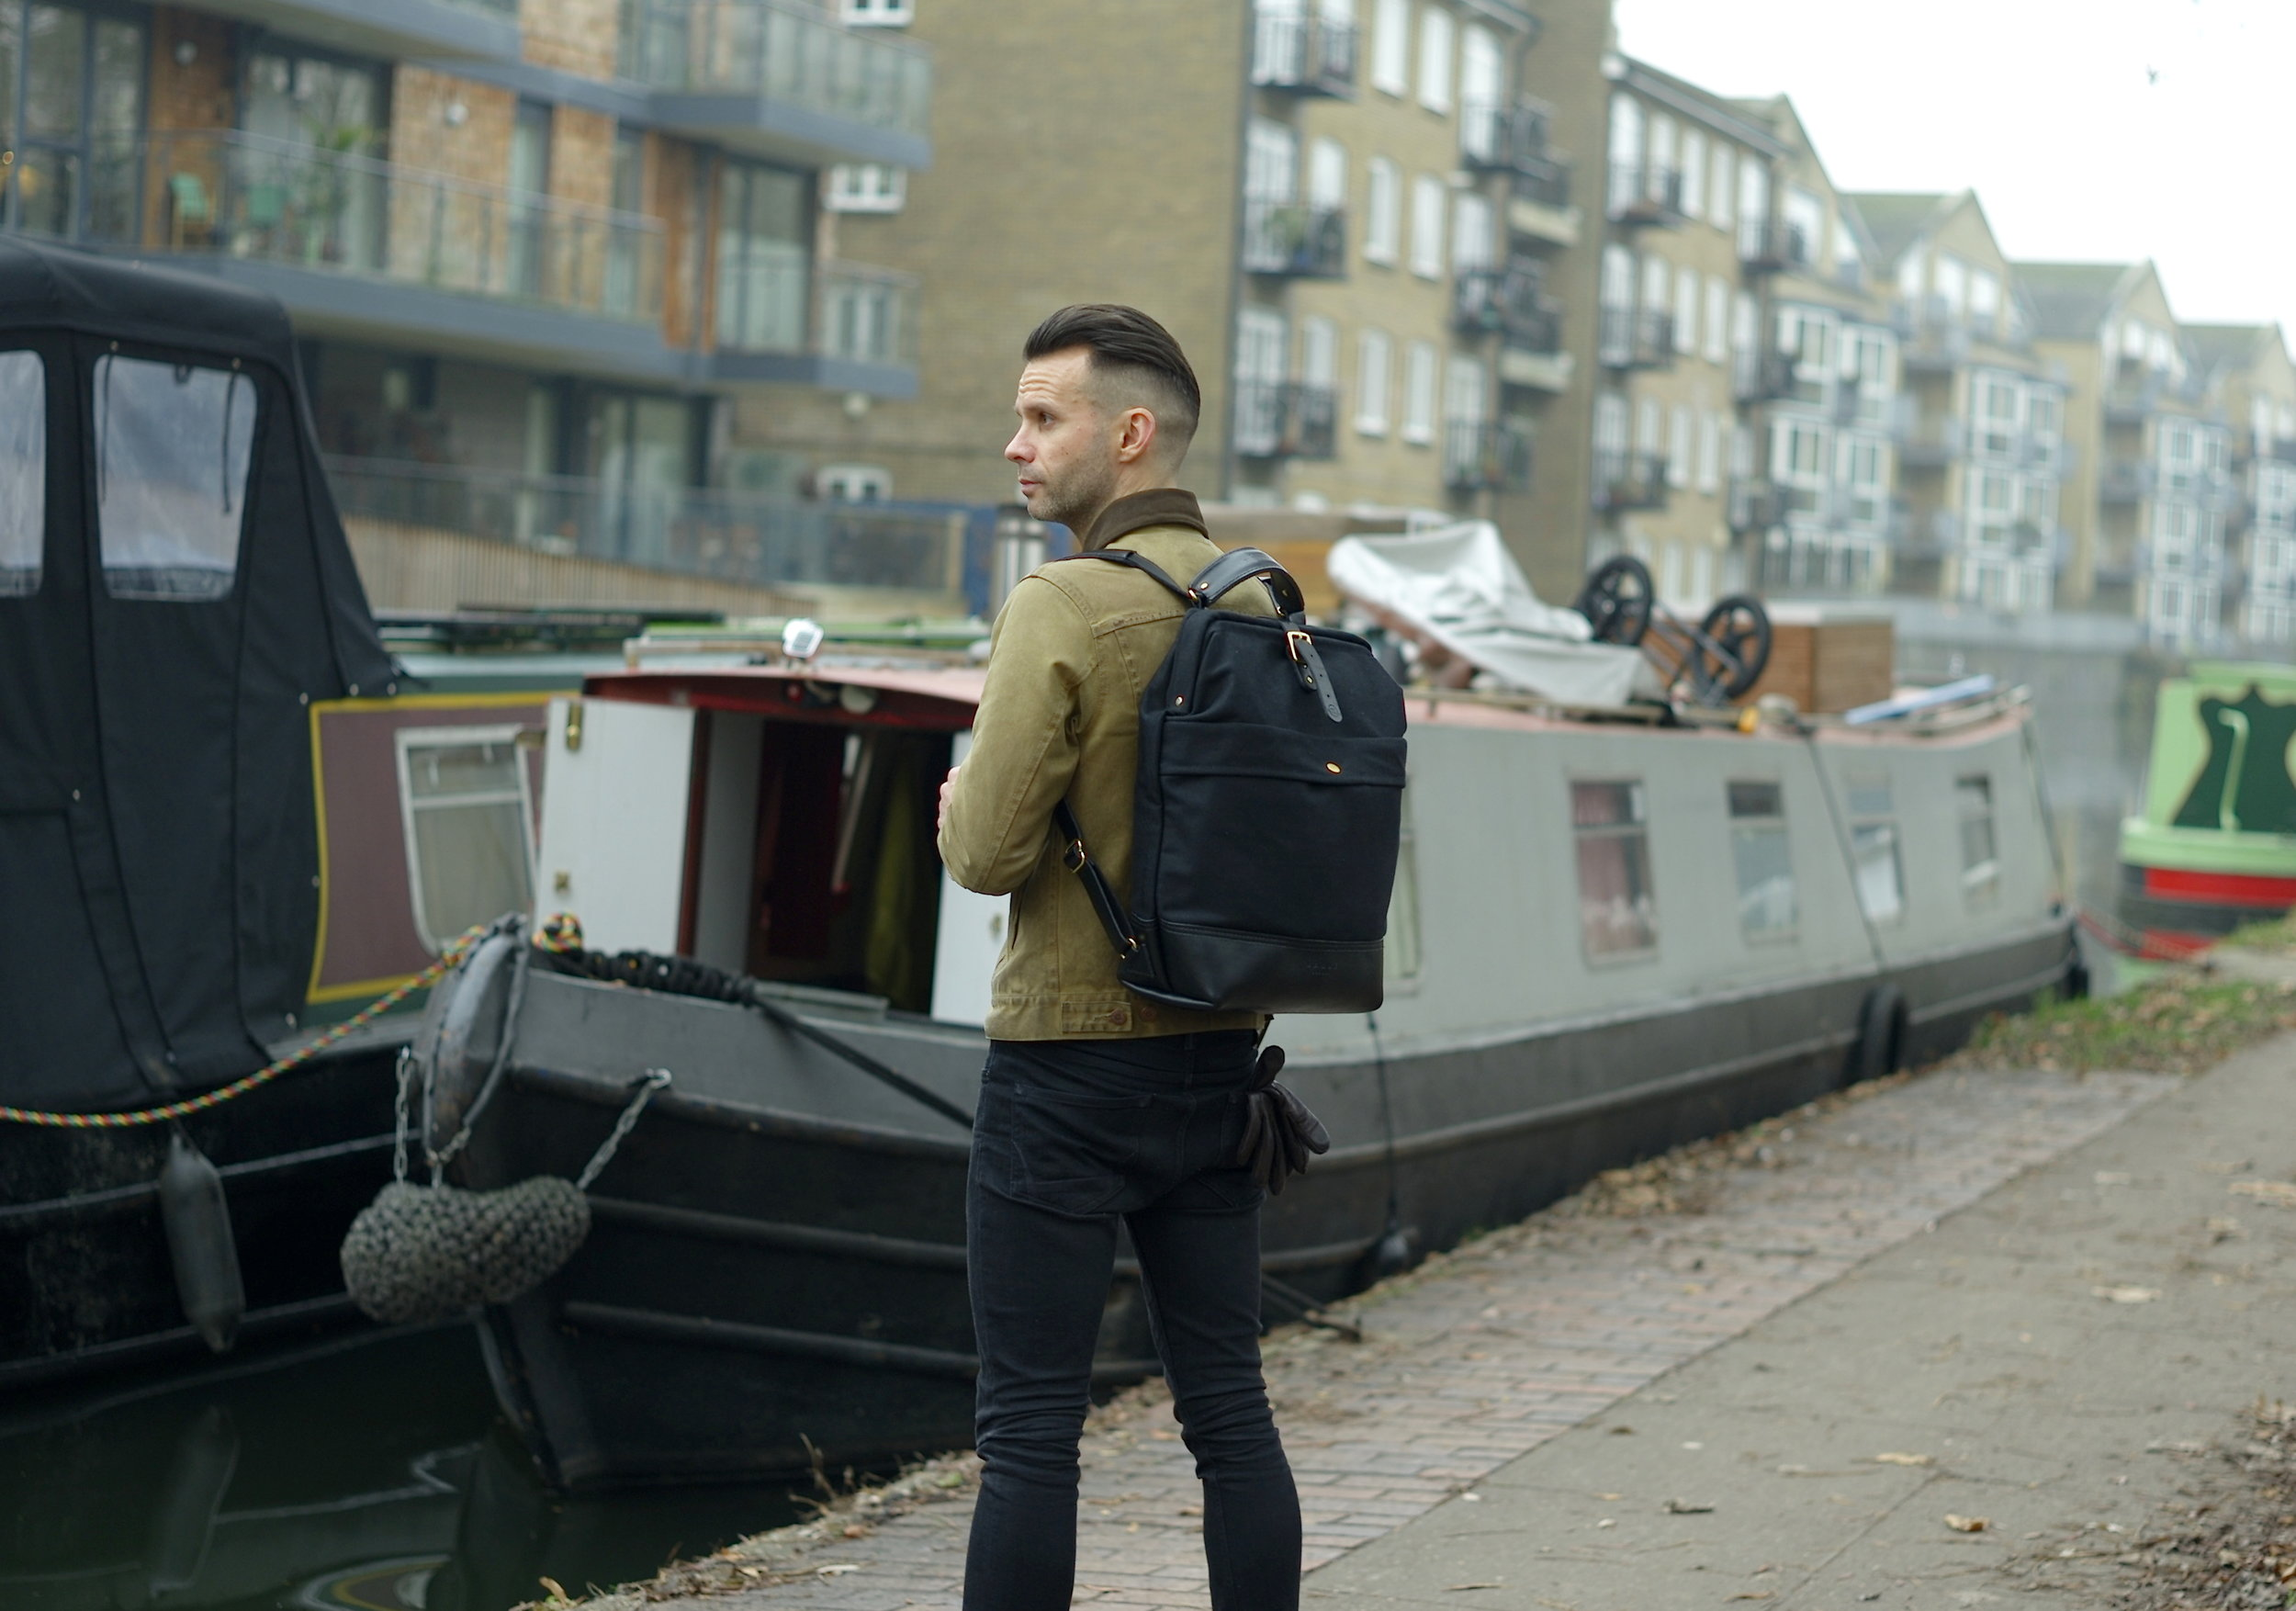 Casual snob John Hybrid Backpack Bartosz Gajec  2.JPG